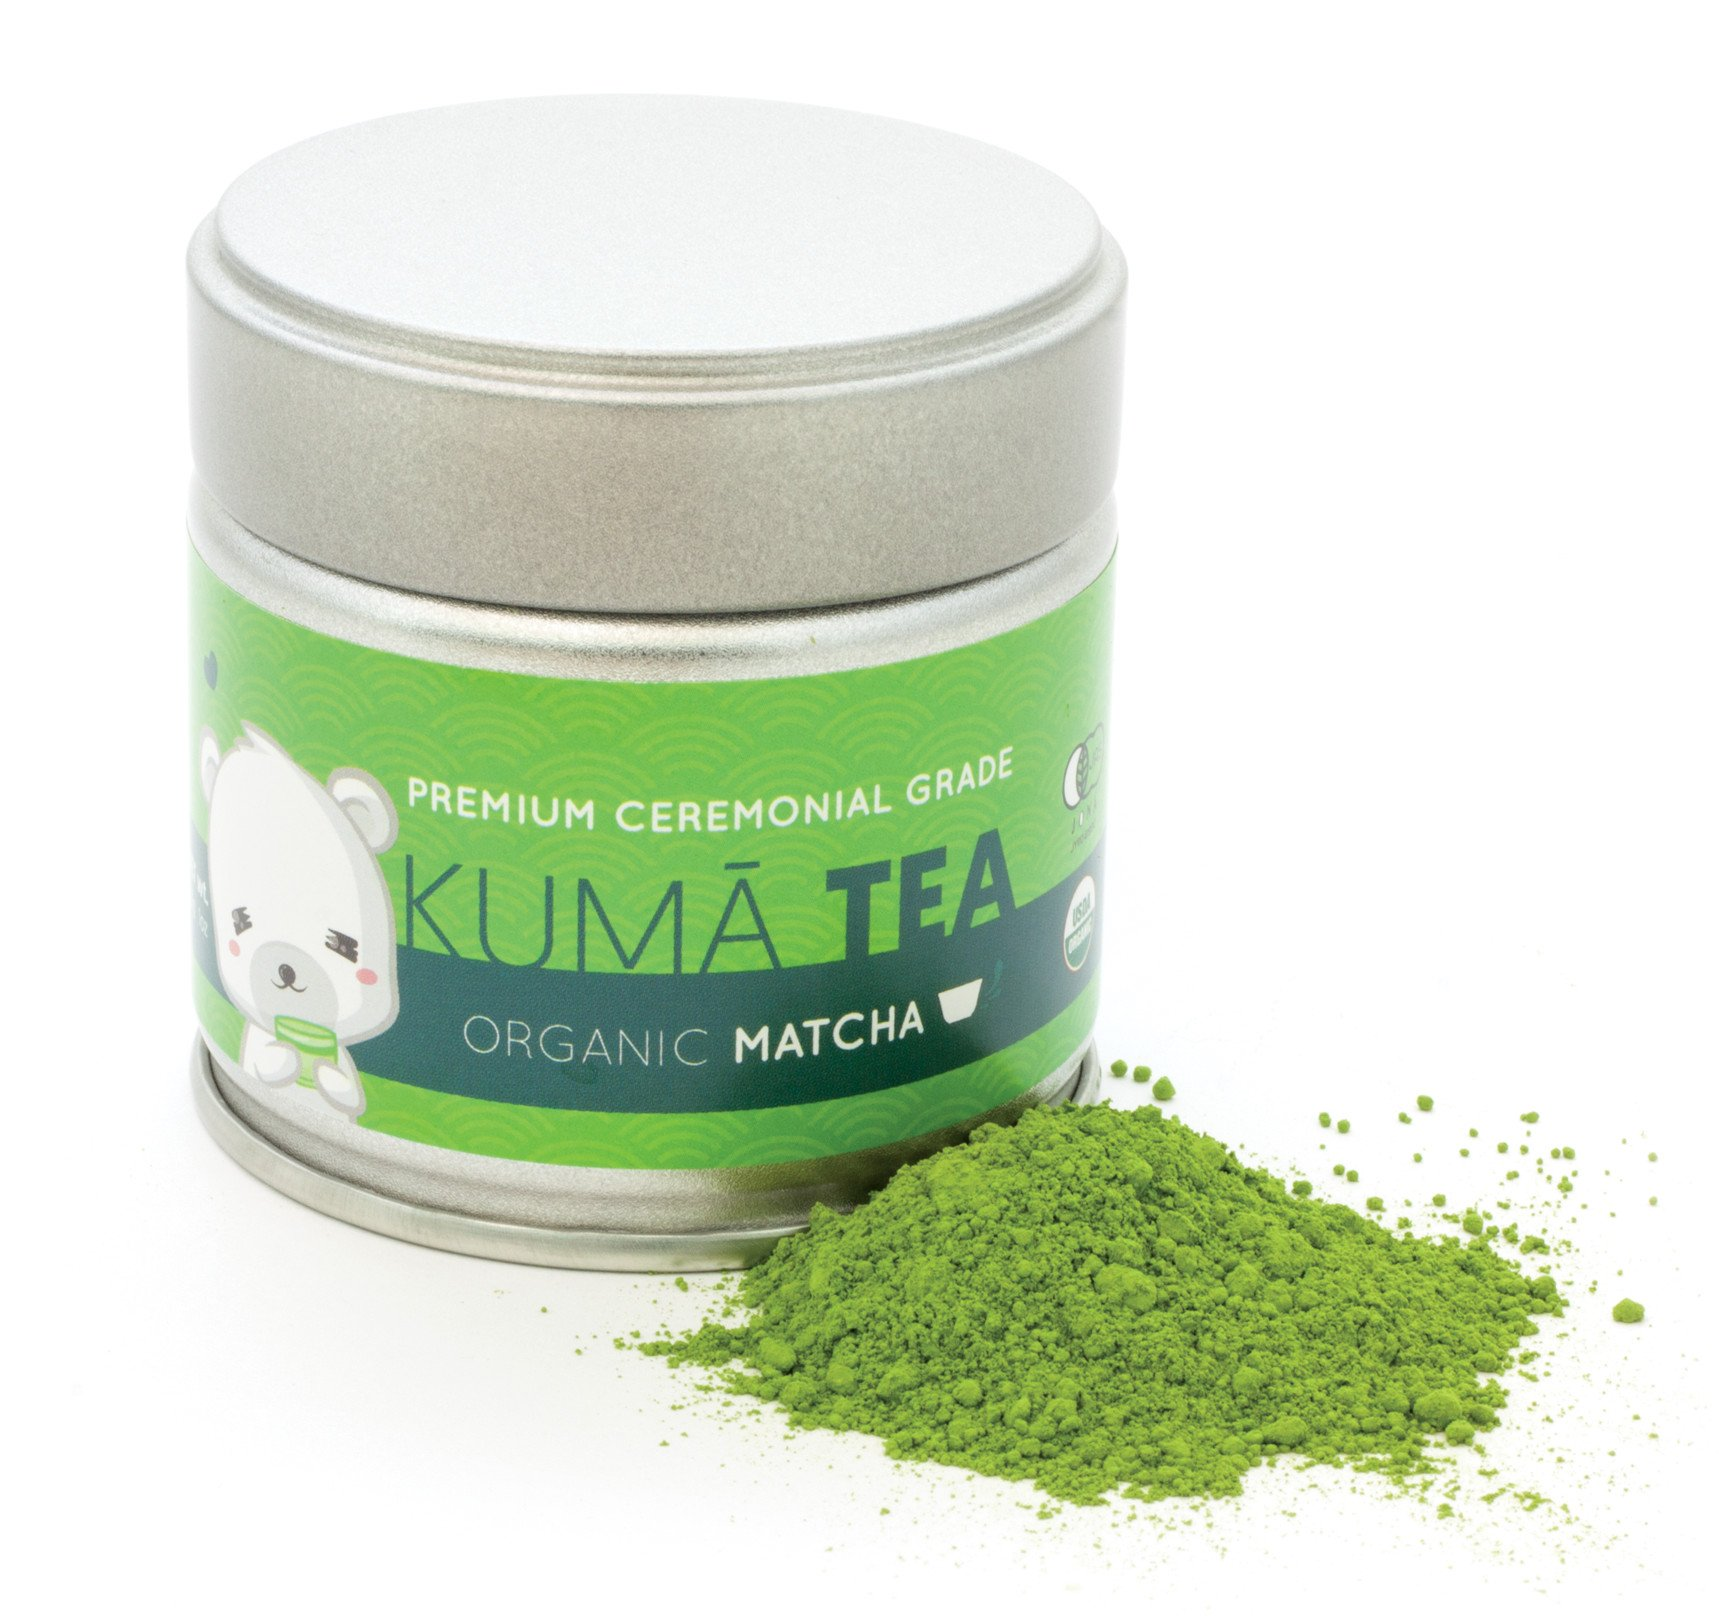 Kuma Tea - Organic Japanese Matcha Green Tea Powder - Premium Ceremonial Grade (30g)